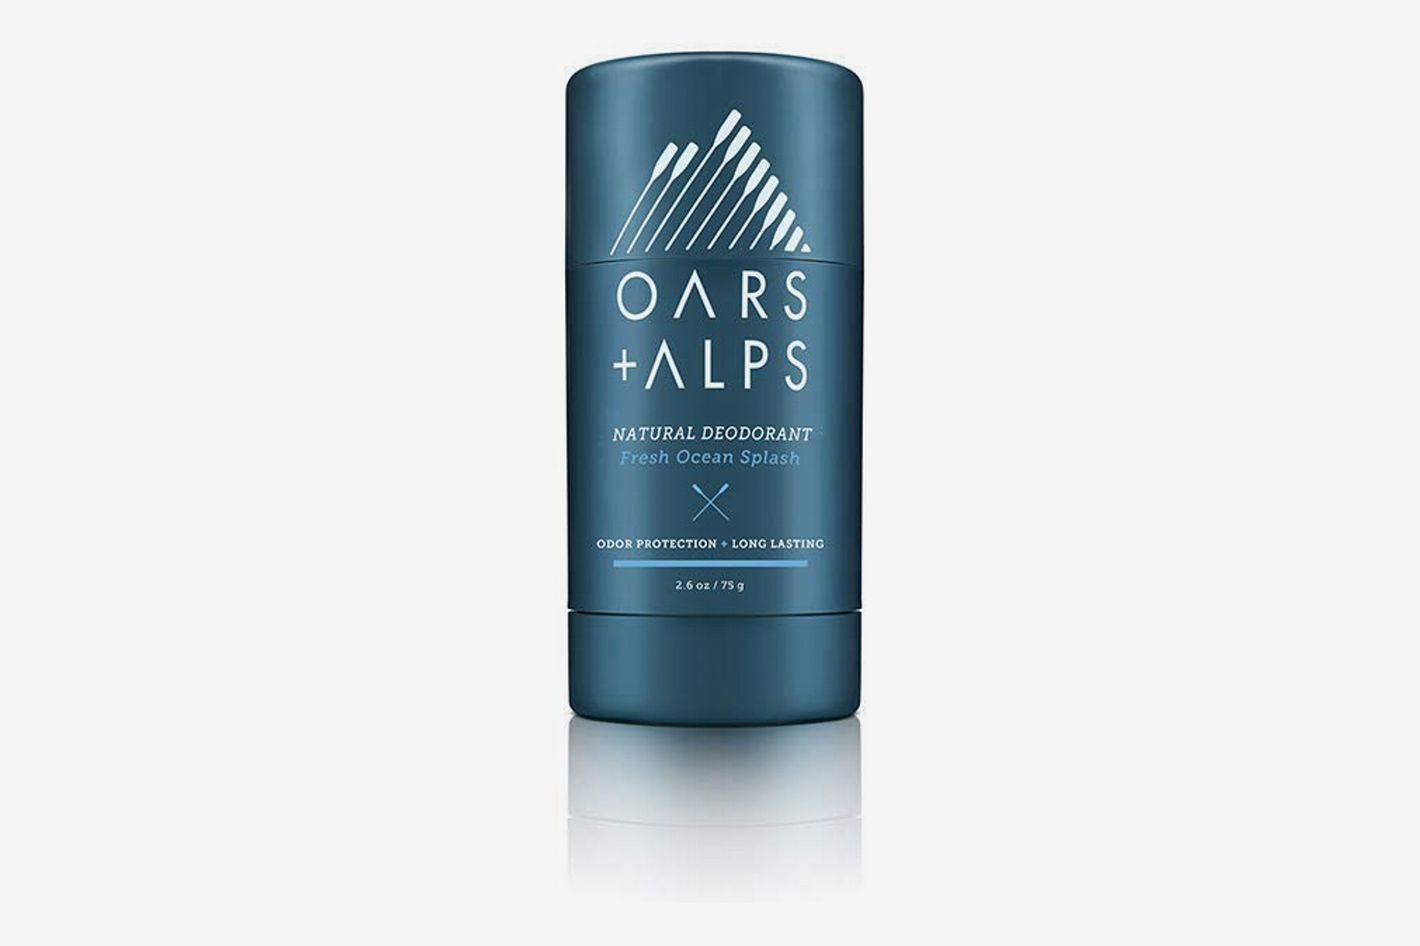 Oars + Alps Natural Deodorant